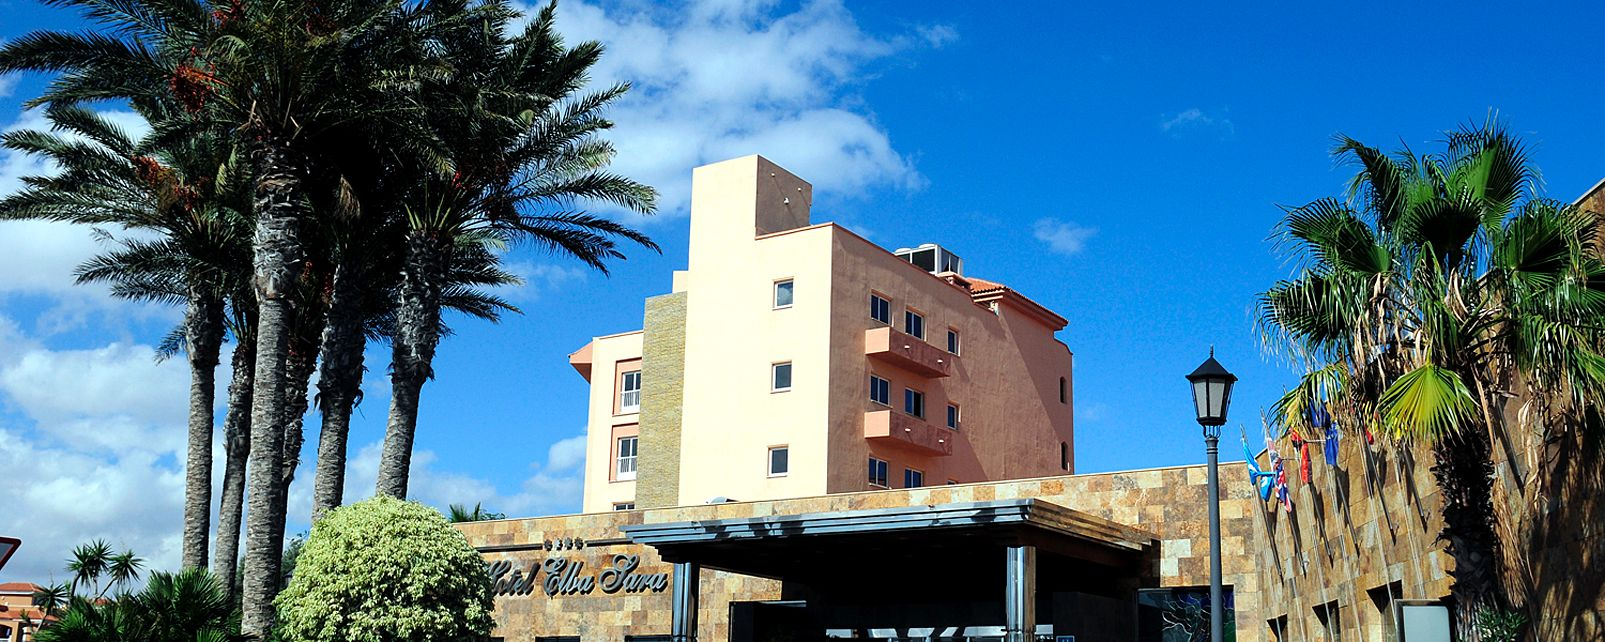 Hôtel Elba Sara Beach and Golf Resort